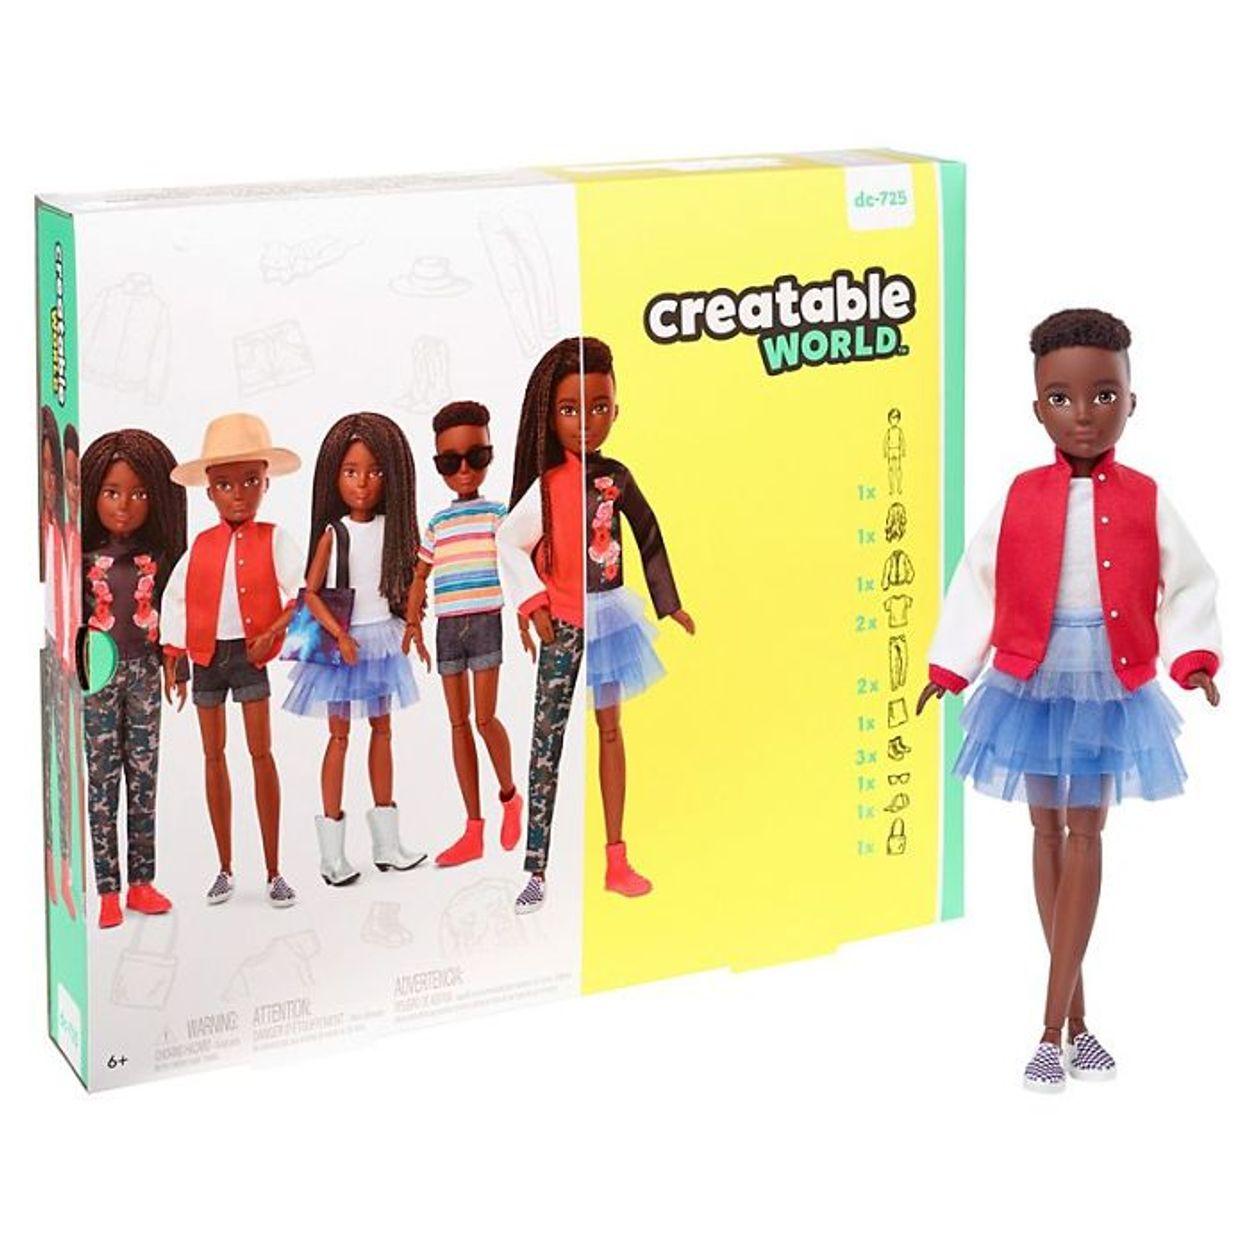 2A5 5d8c69bfabf63-gender-neutral-dolls-toy-company-mattel-1-3-5d8b34fe0f745__700